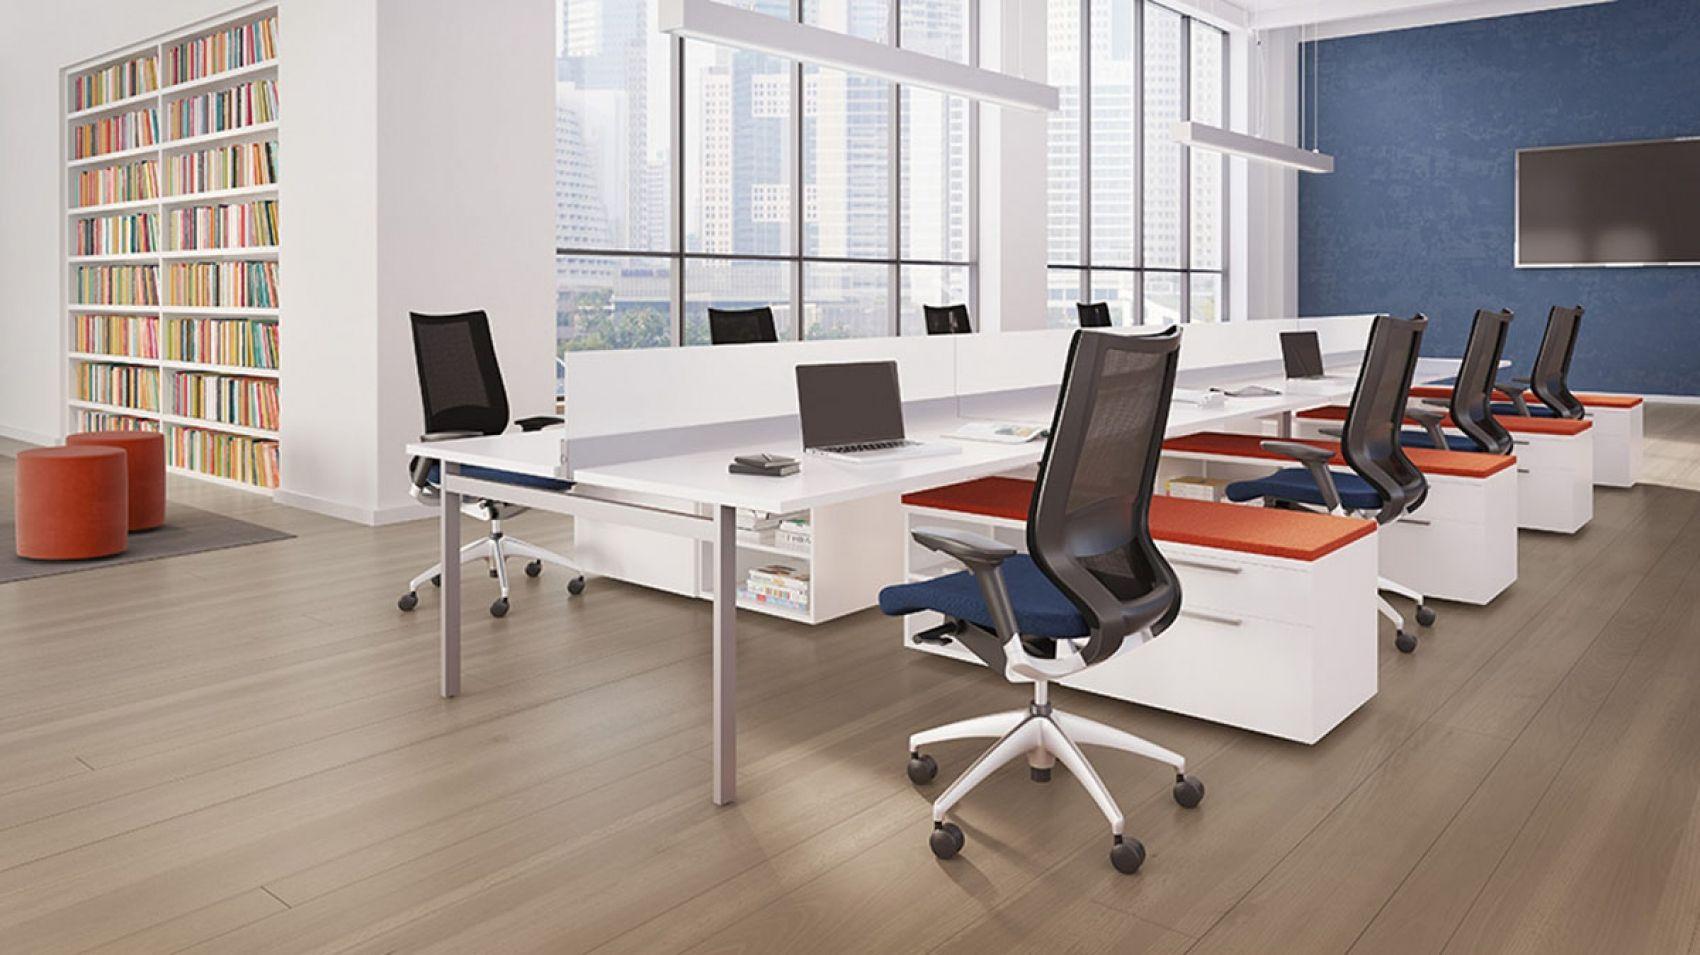 STAKS Corporate interior design, Office interior design